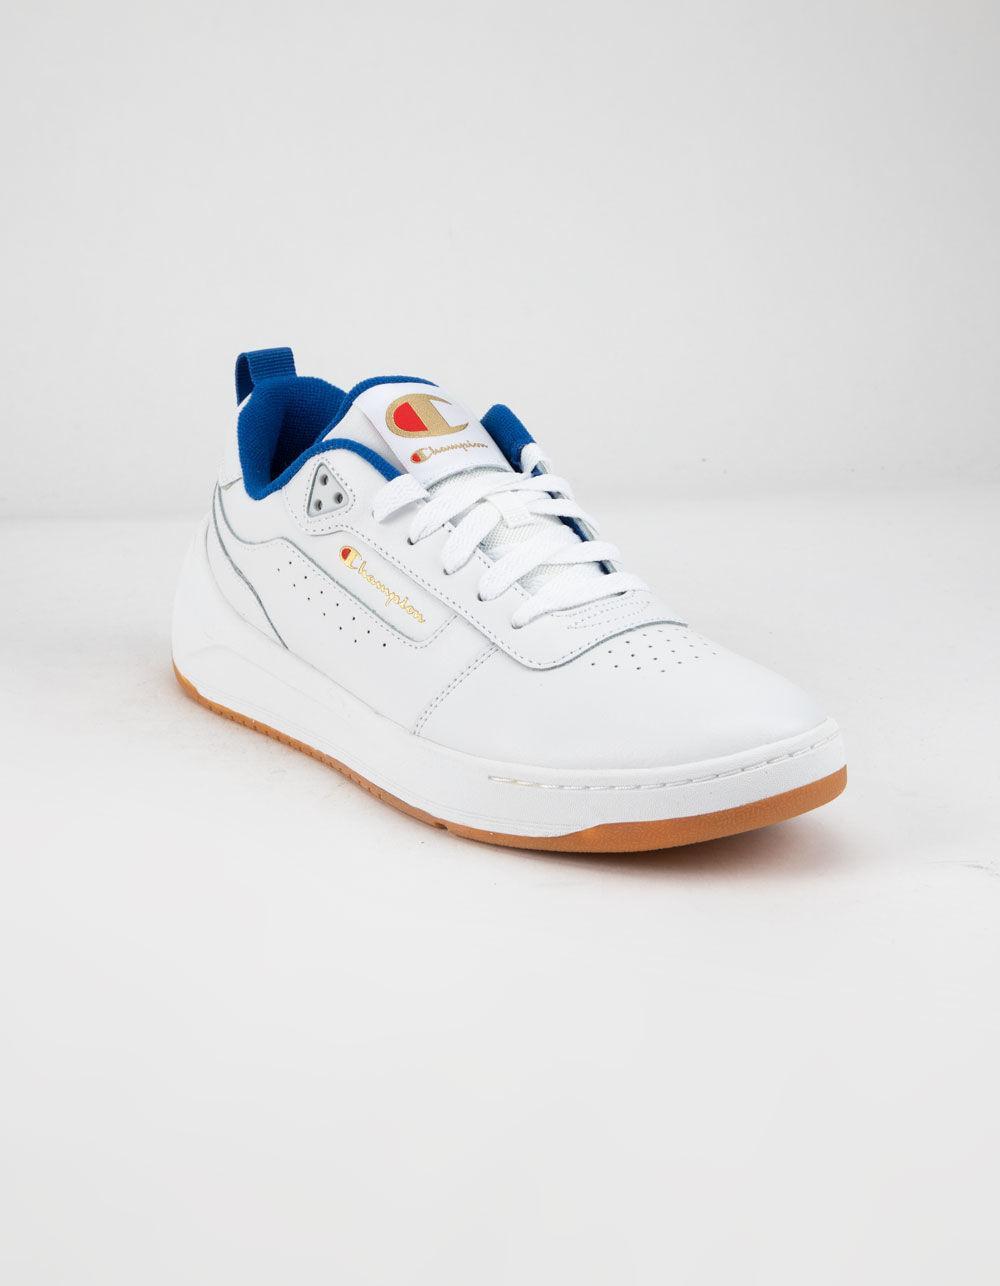 48fdbf7a7e3f4 Lyst - Champion White Super C Court Classic Shoes in White for Men - Save 1%